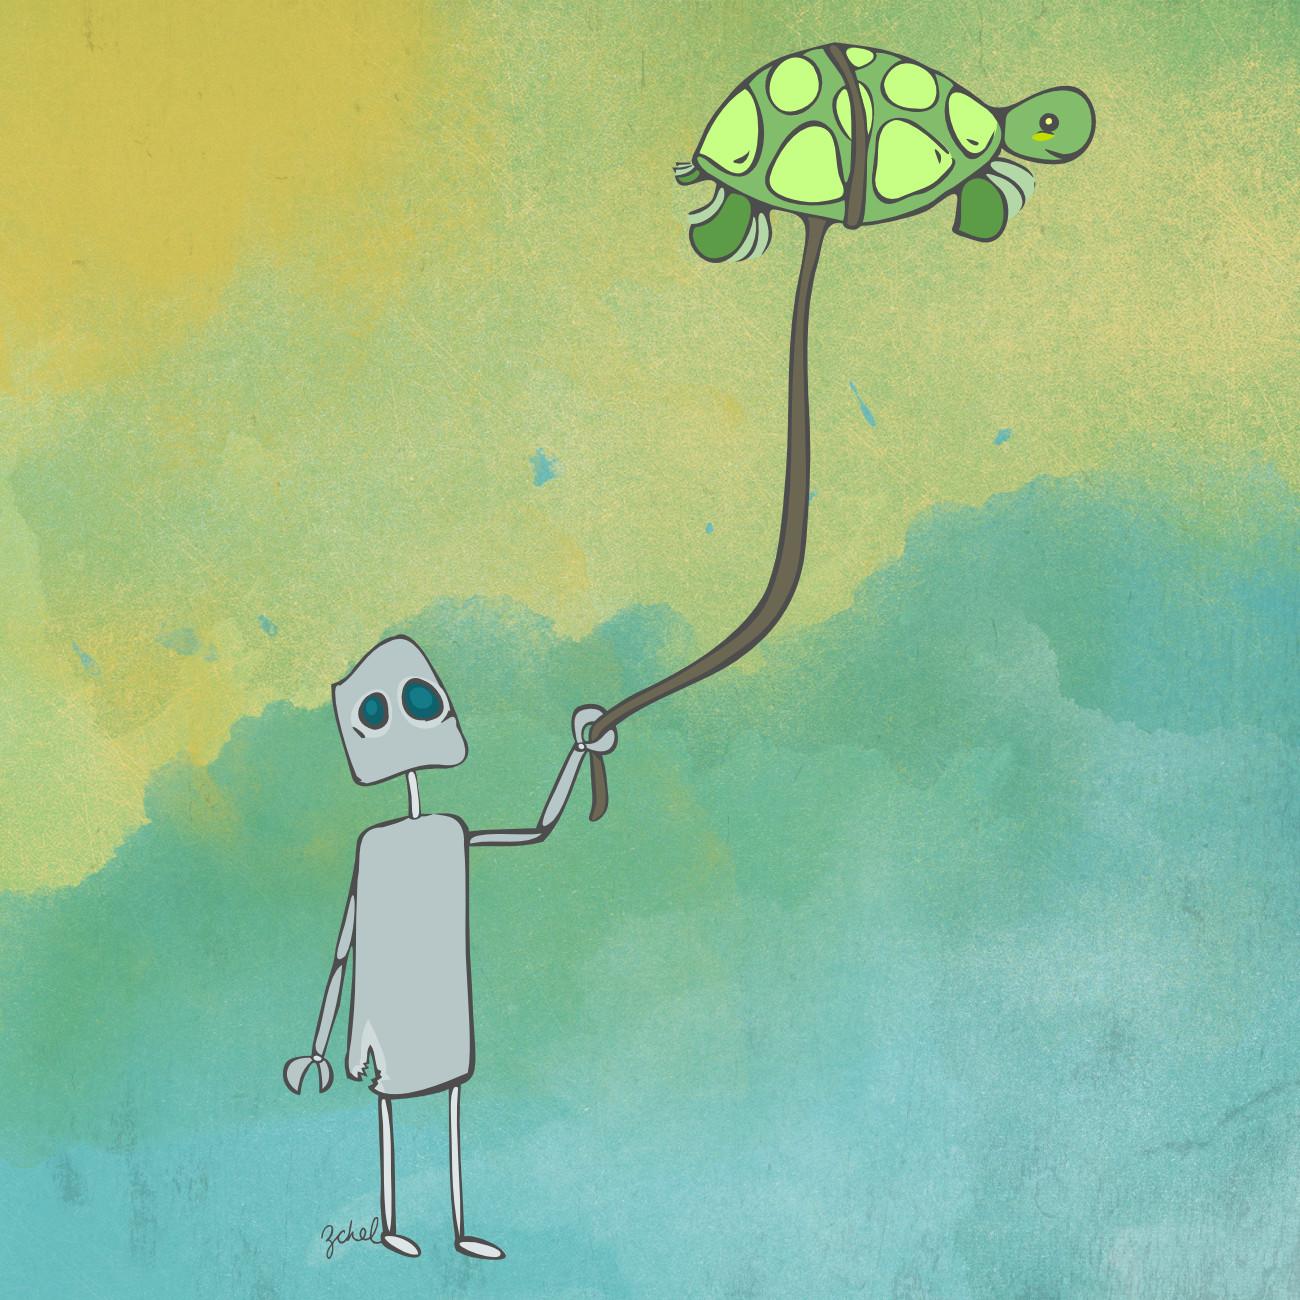 turtle walk design